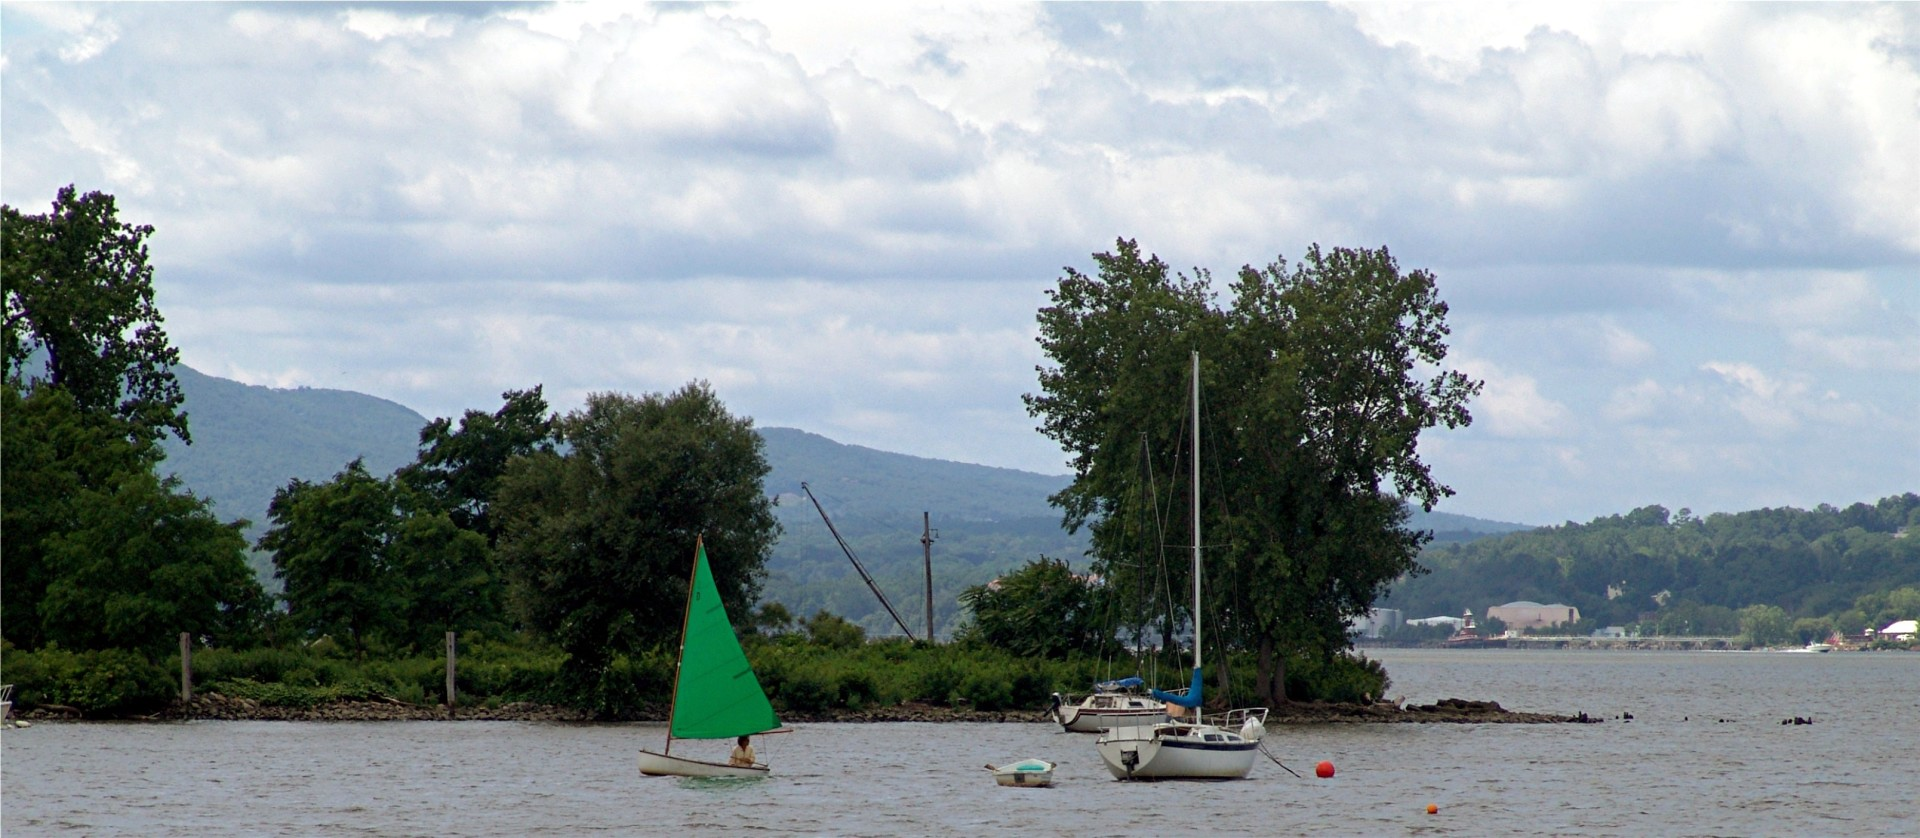 Sailboat on Hudson